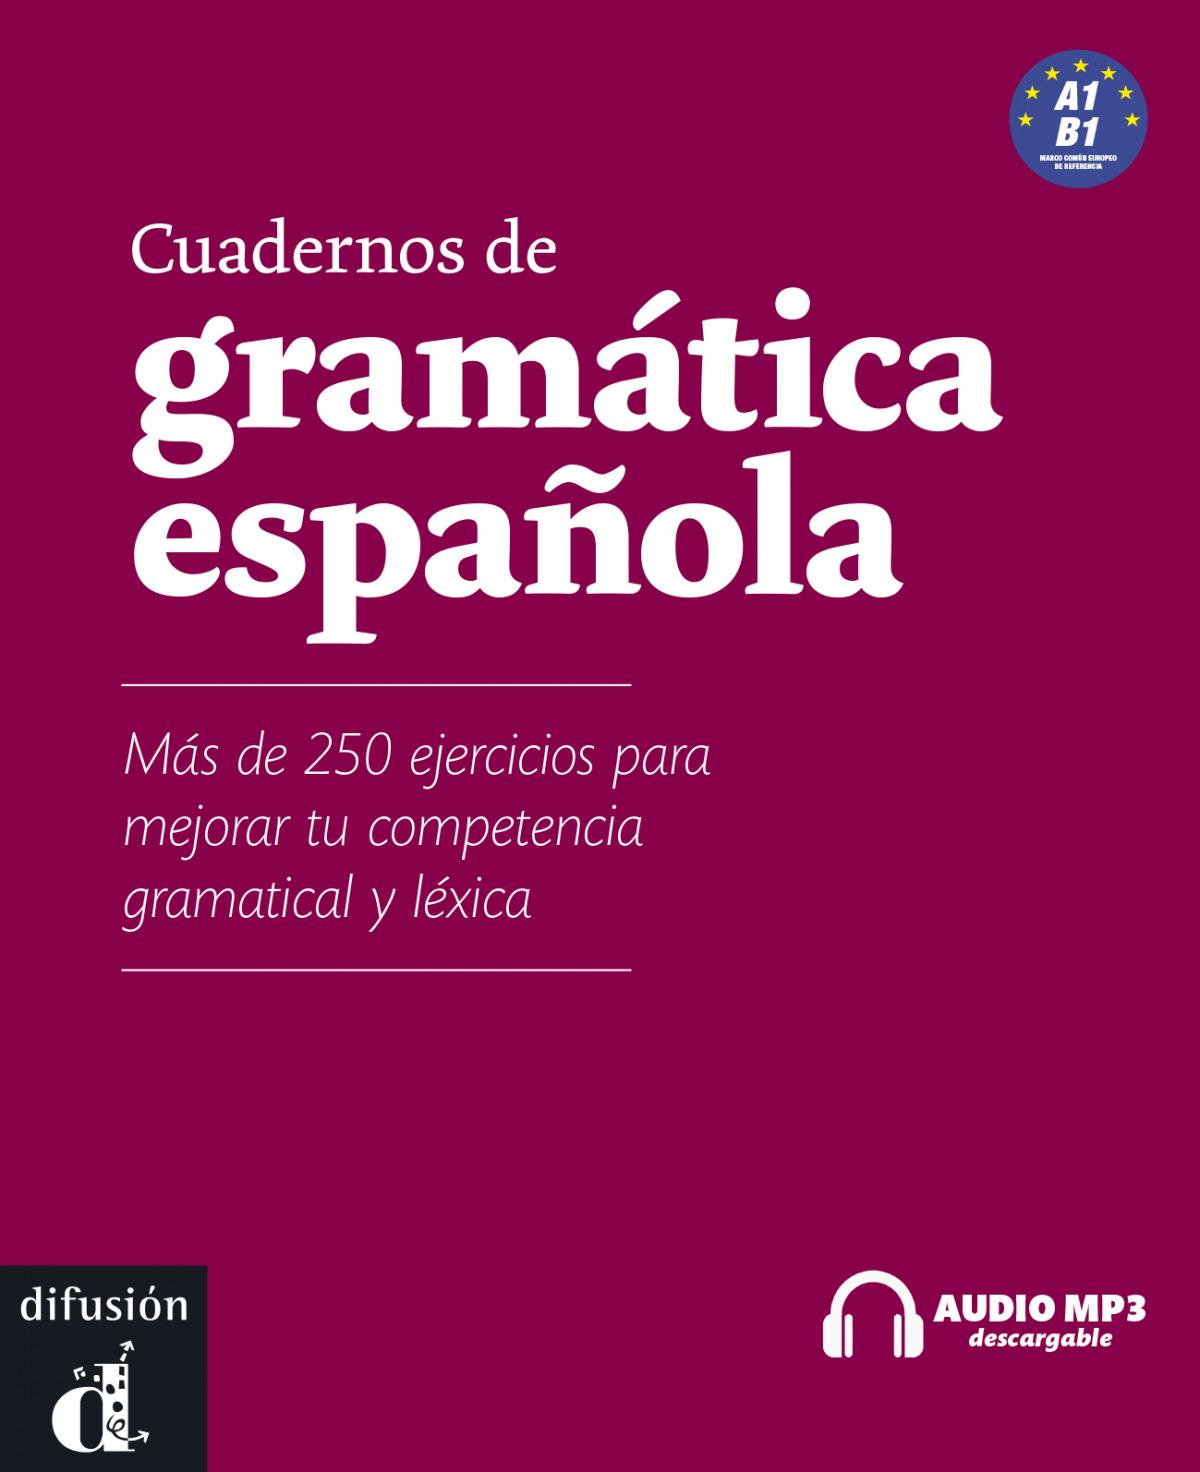 CUADERNOS GRAMÁTICA ESPAñOLA A1-B1 +MP3 9788484438588